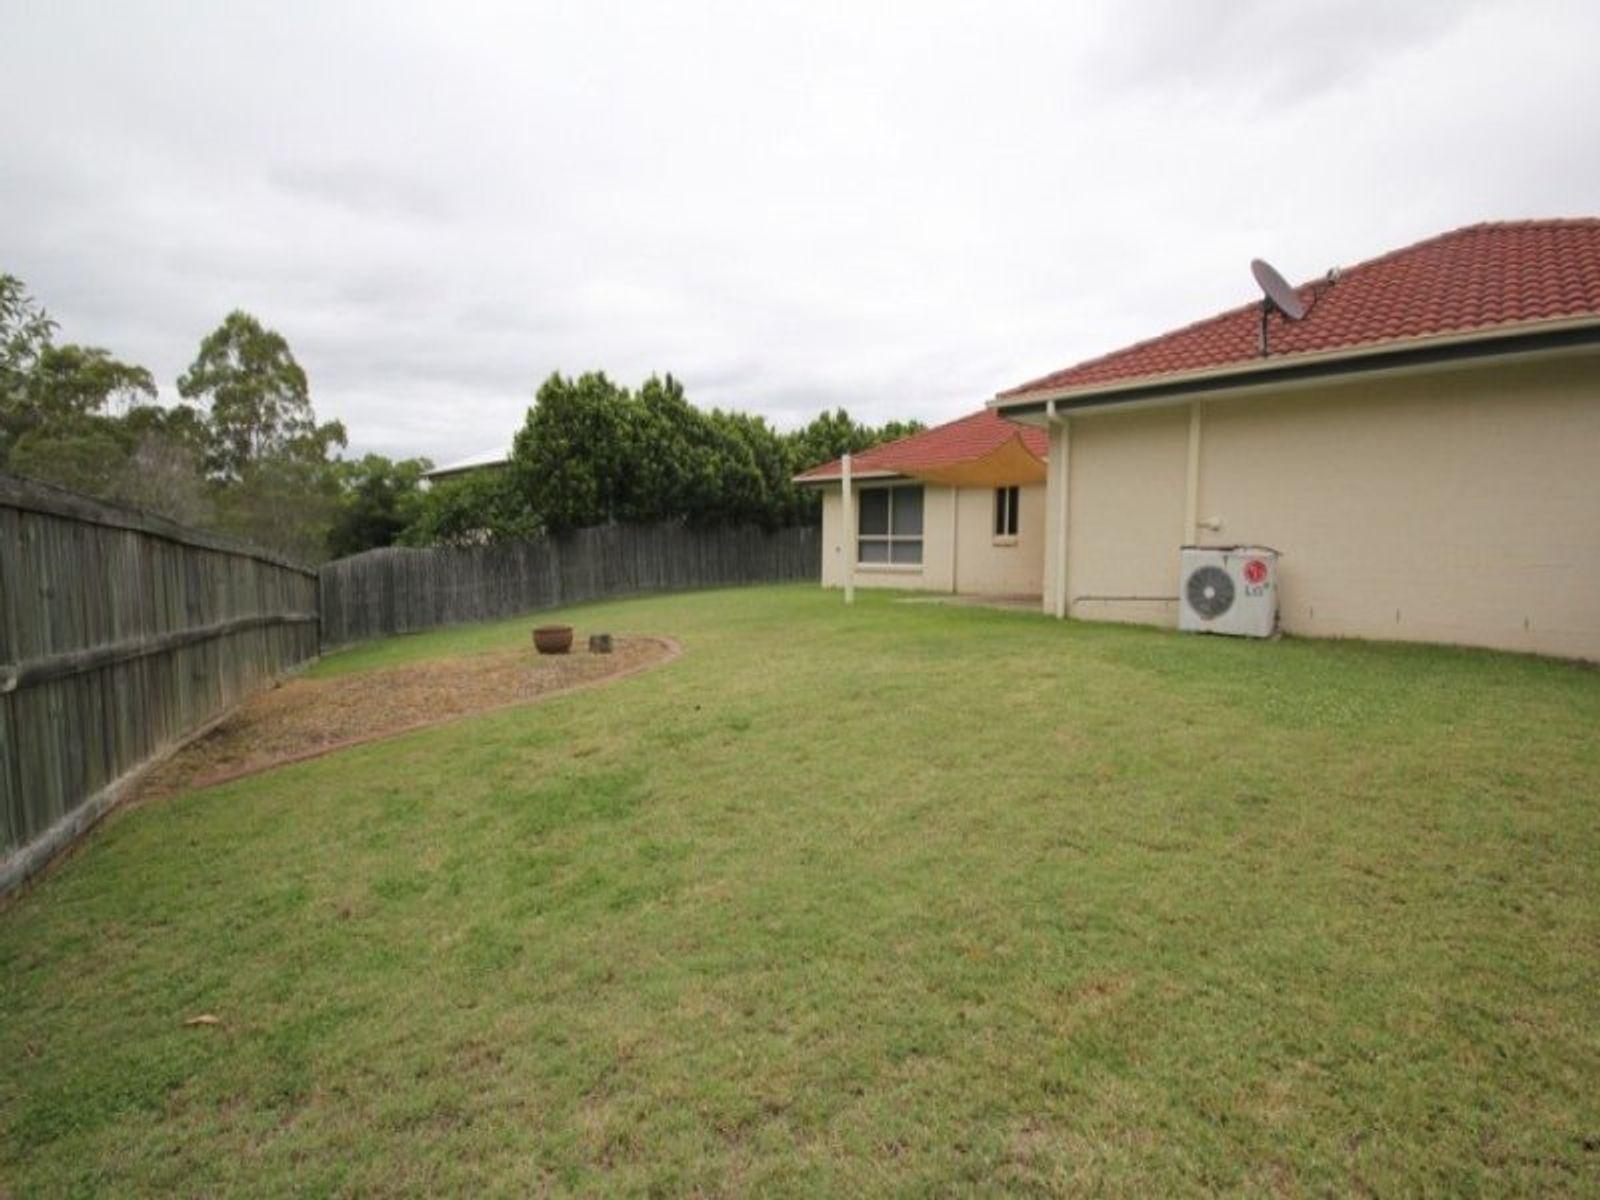 66 Coventina Crescent, Springfield Lakes, QLD 4300